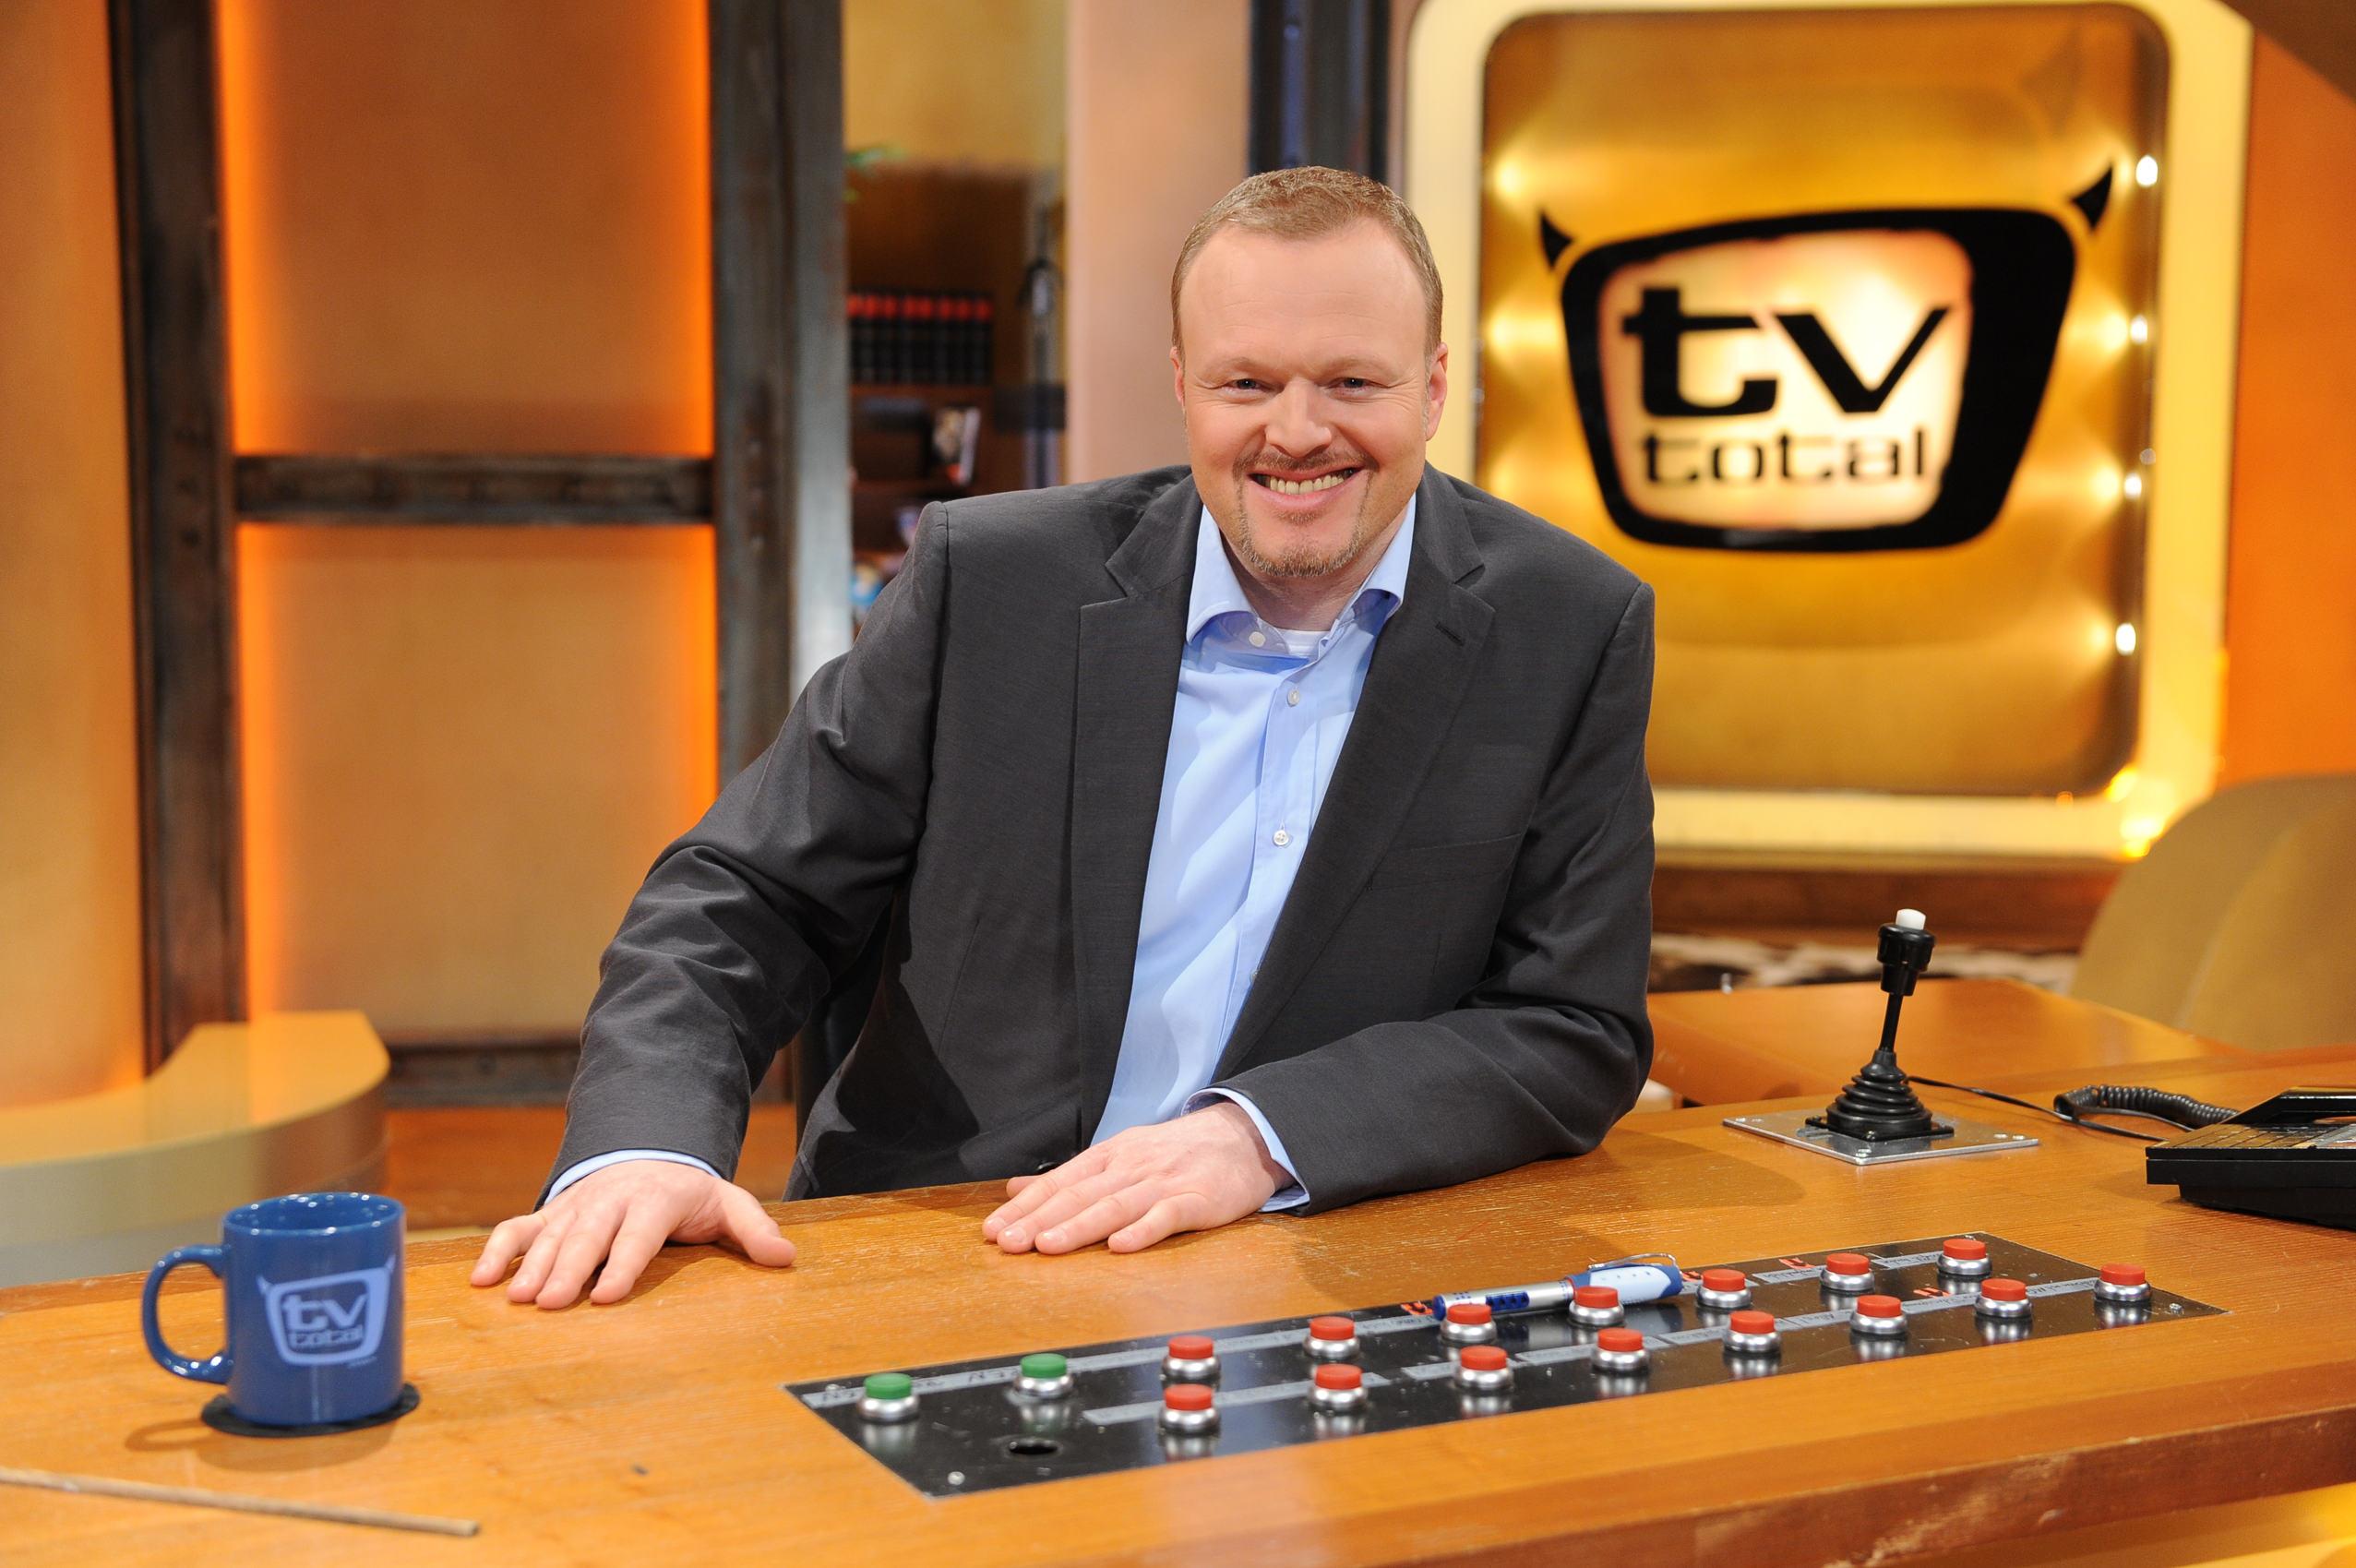 tv total nippelboard